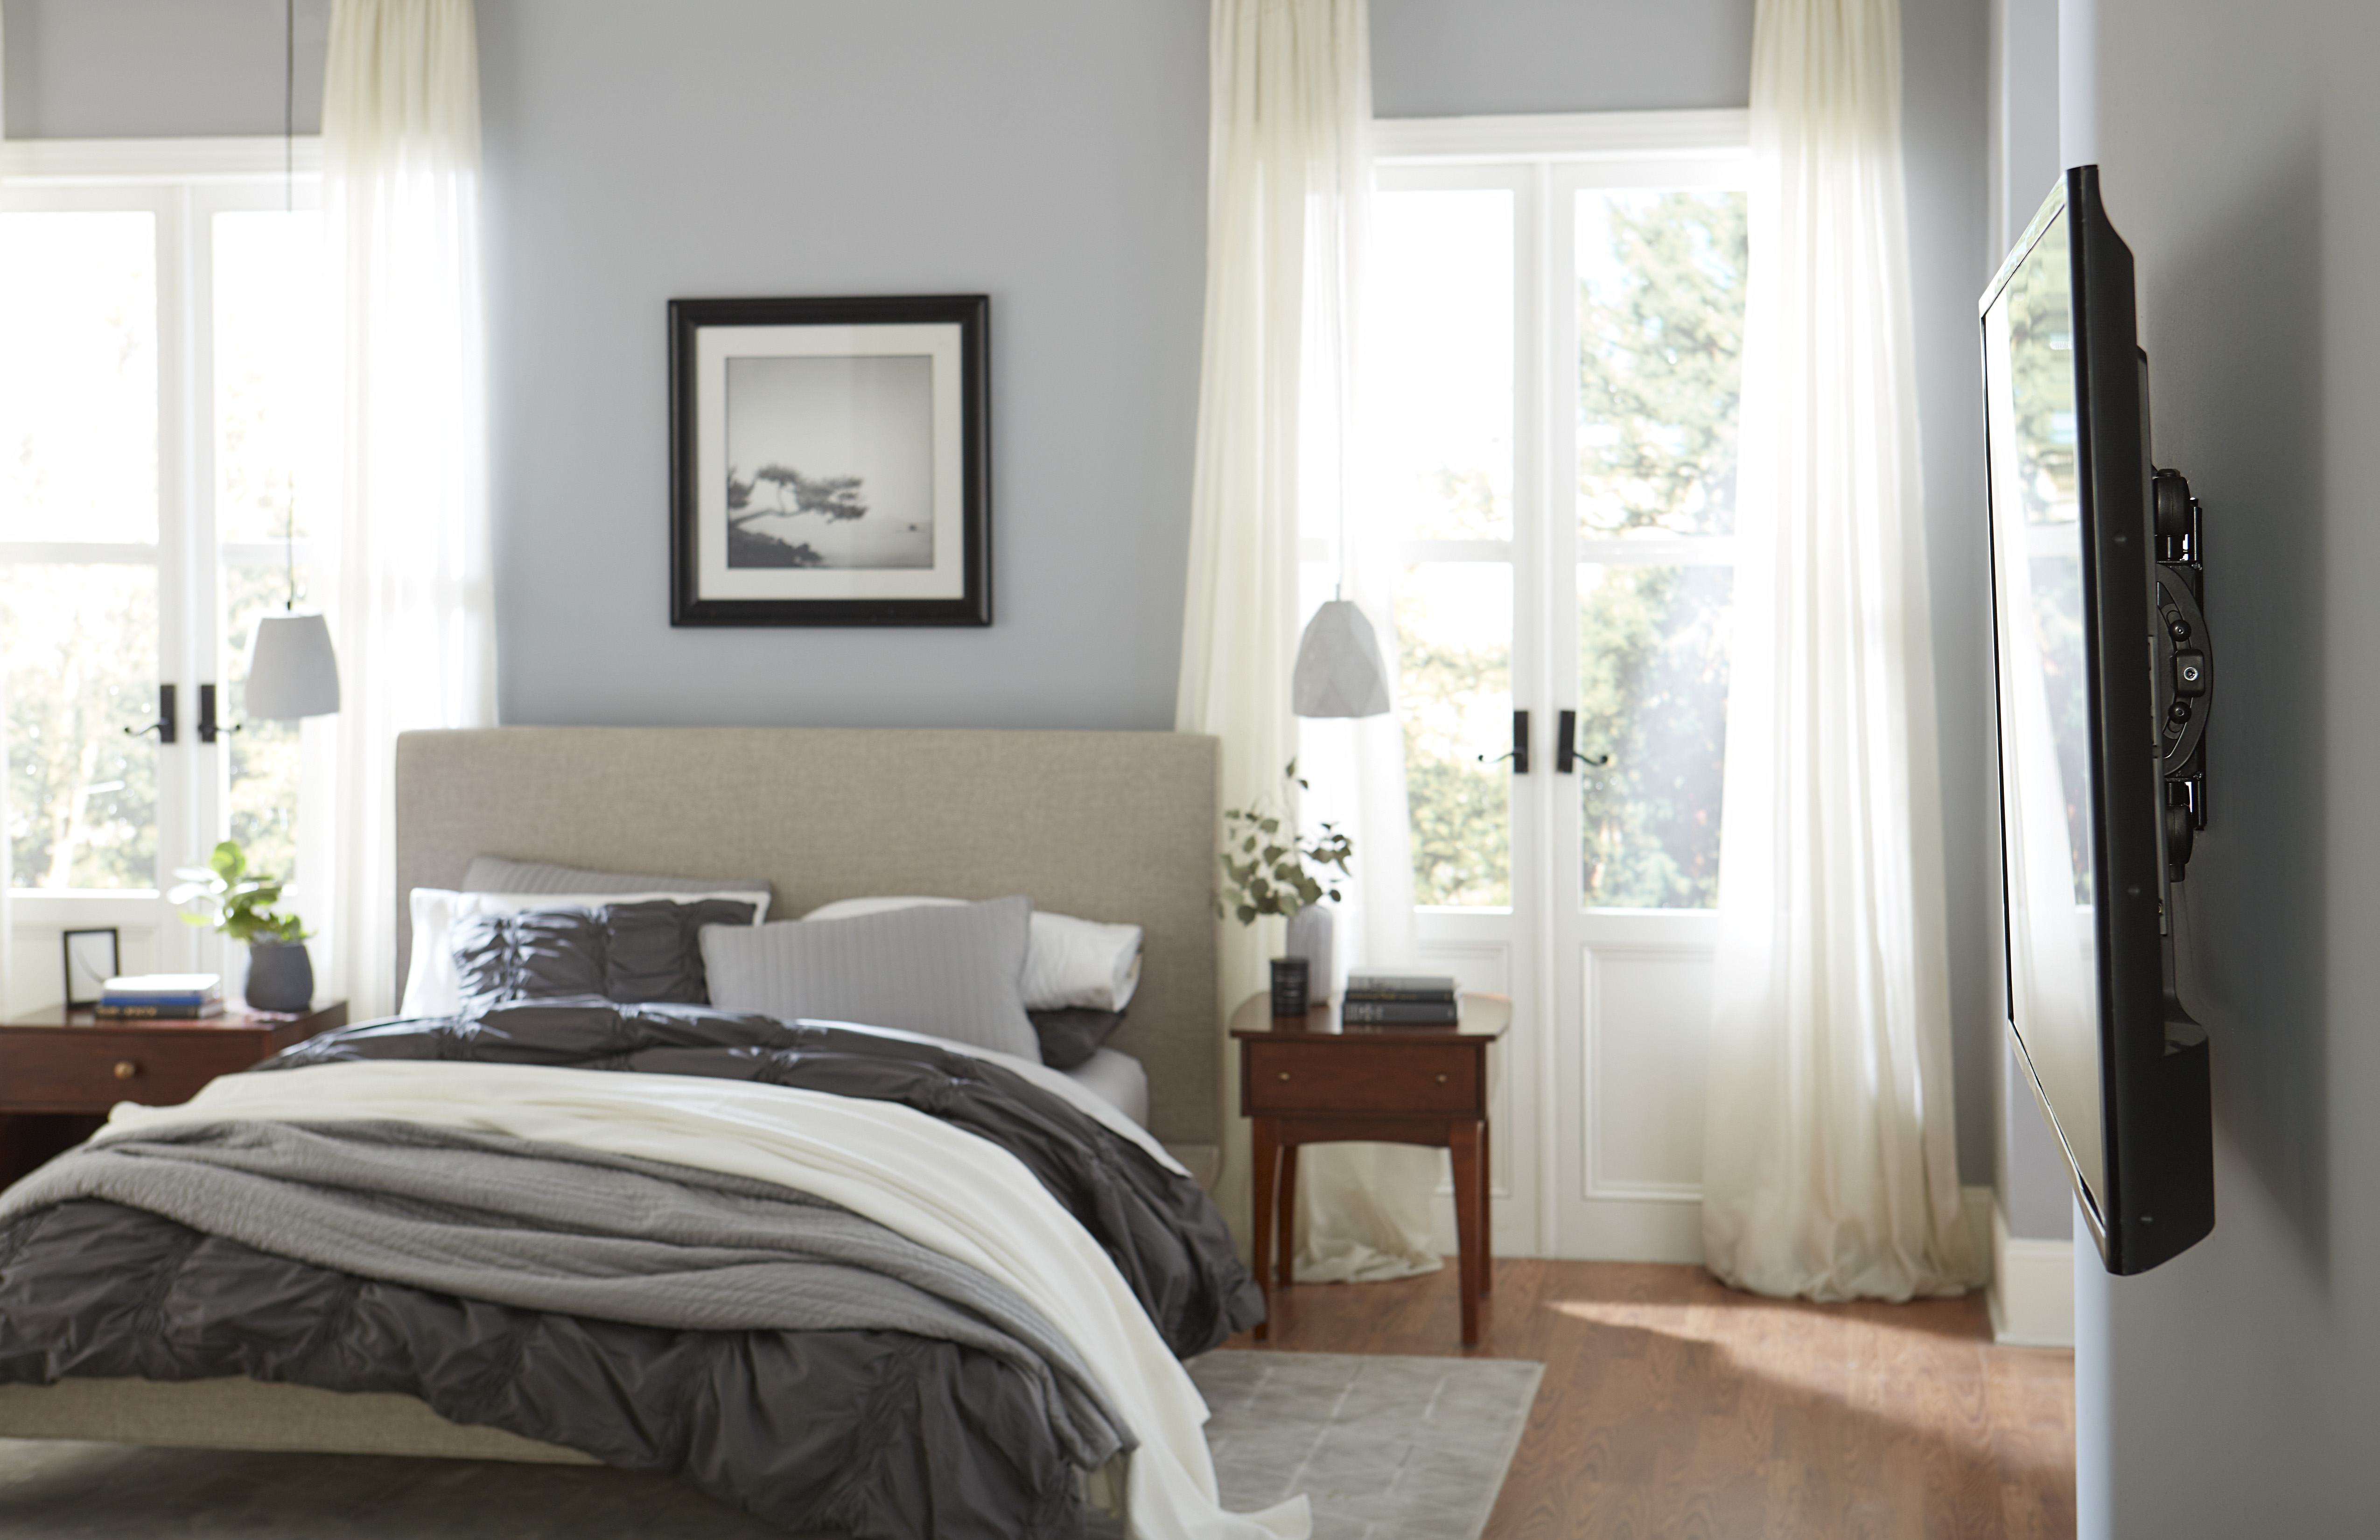 TV mounted in bedroom